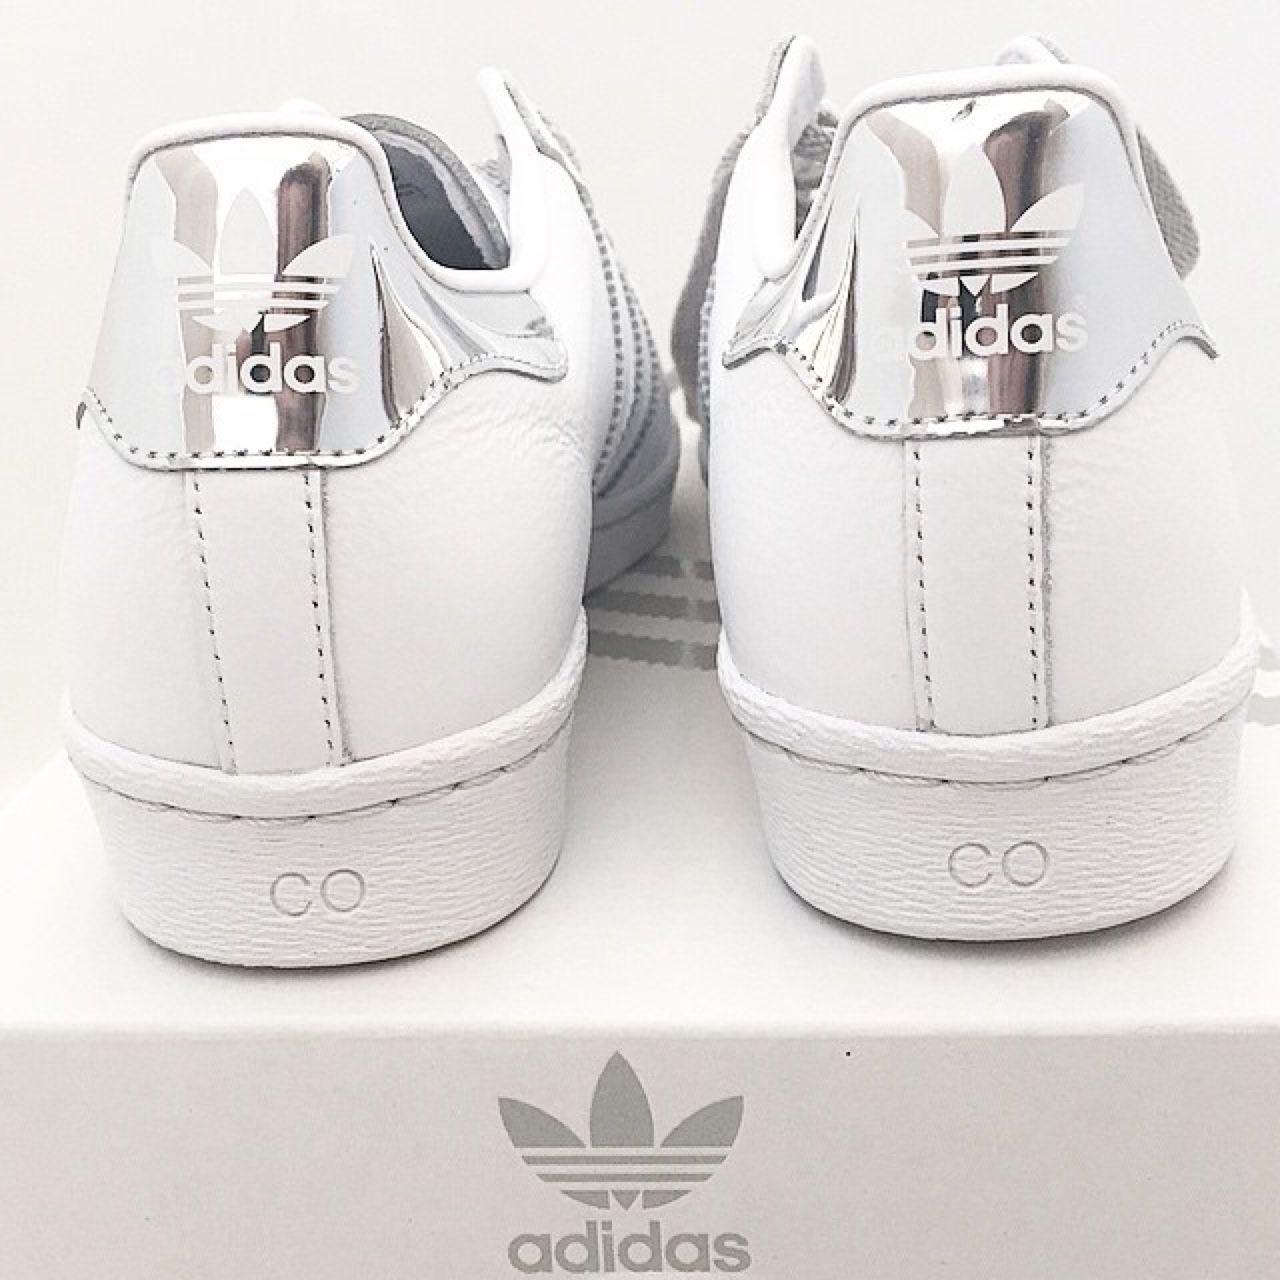 adidas superstar mujer silver